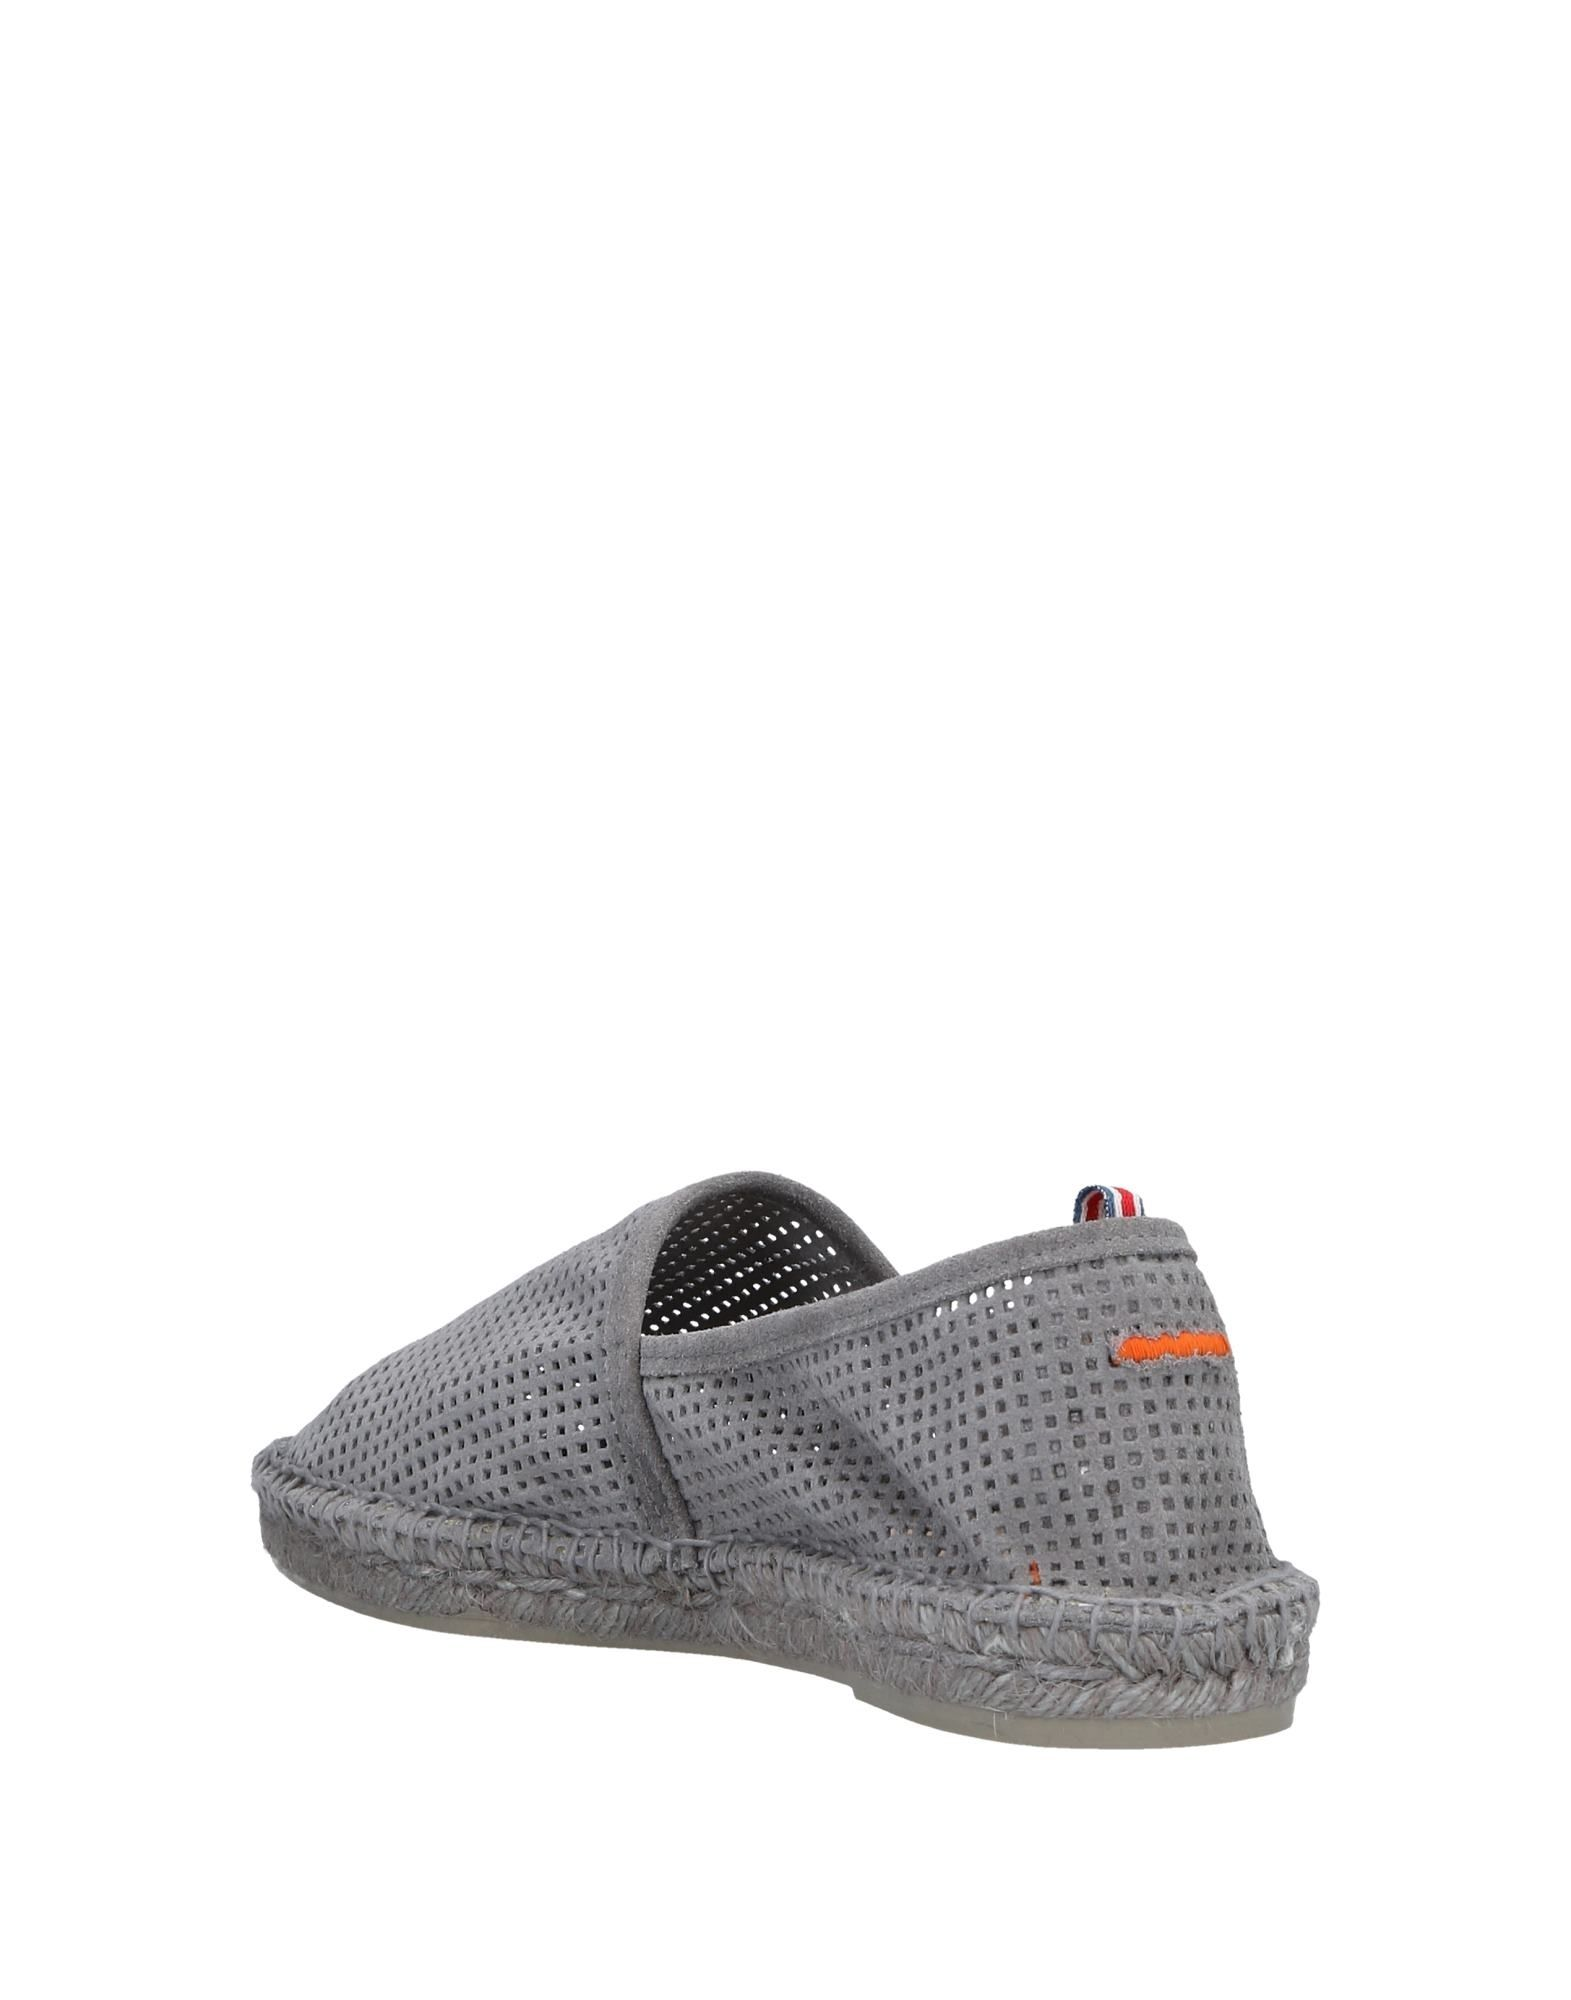 Rabatt echte Schuhe Castañer Espadrilles  Herren  Espadrilles 11535786FT f0ce47